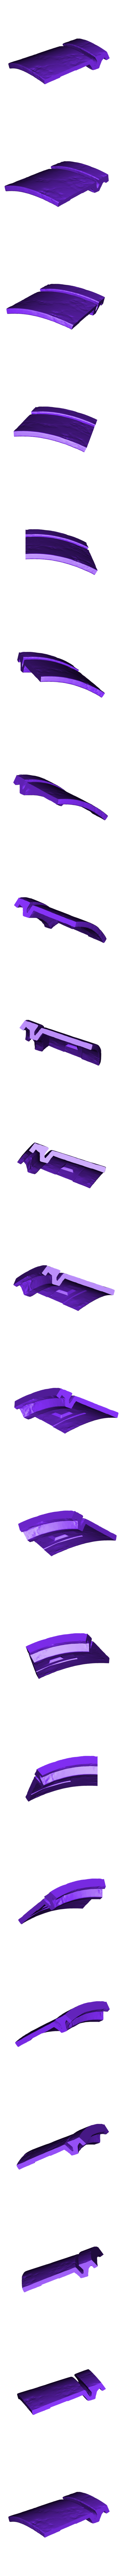 Armory_Damaged_Print5.obj Download OBJ file Armory - Knights of Ren Helmet (damaged), 3D print model • 3D print design, 3D-mon